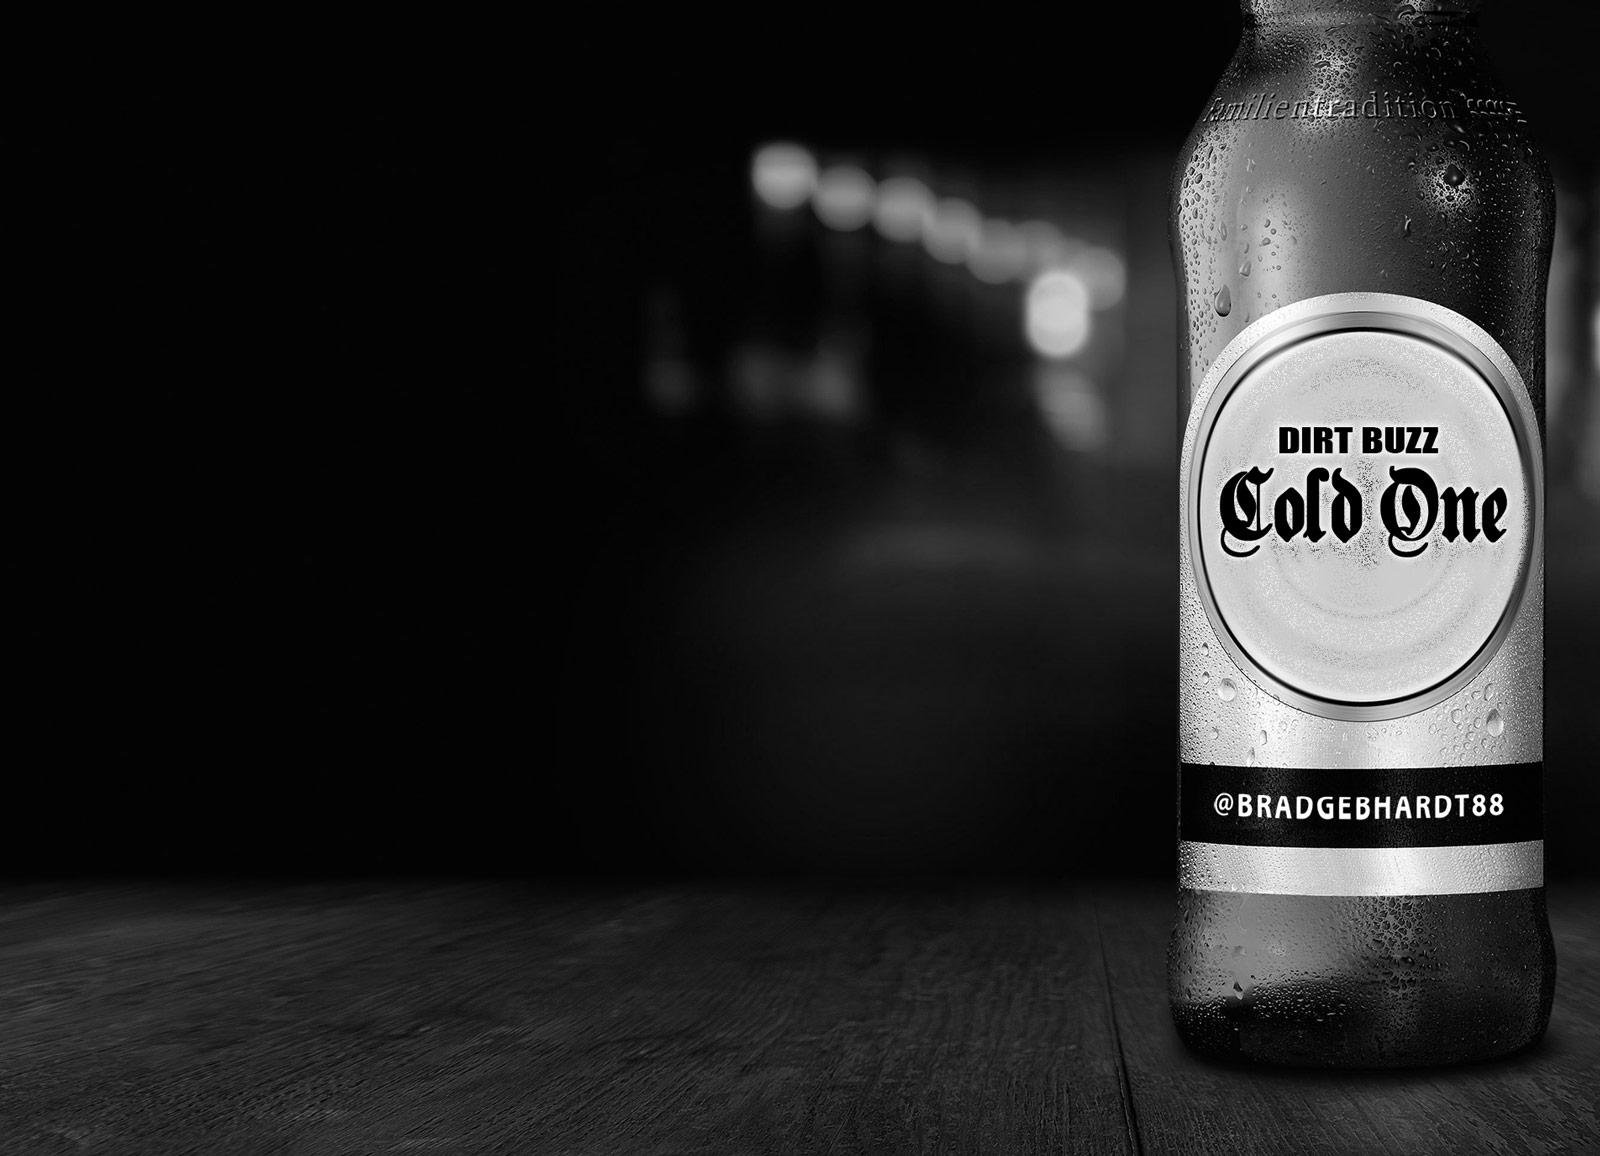 The Cold One ThousandAugust 10th, 2017 - Grand Teton Old Faithful Ale